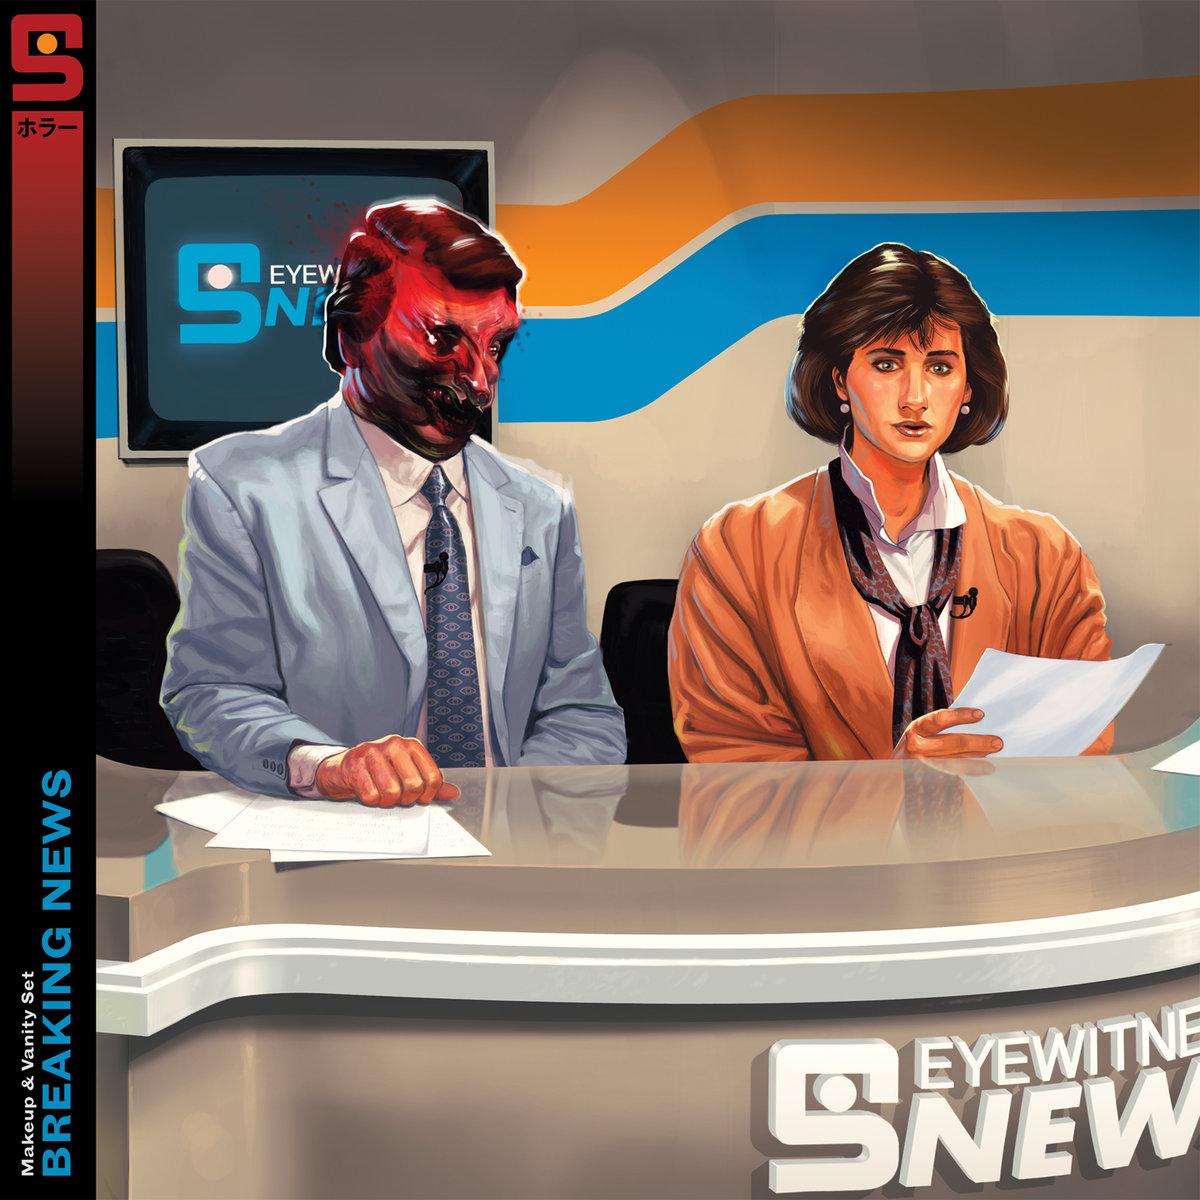 MAVS breaking news